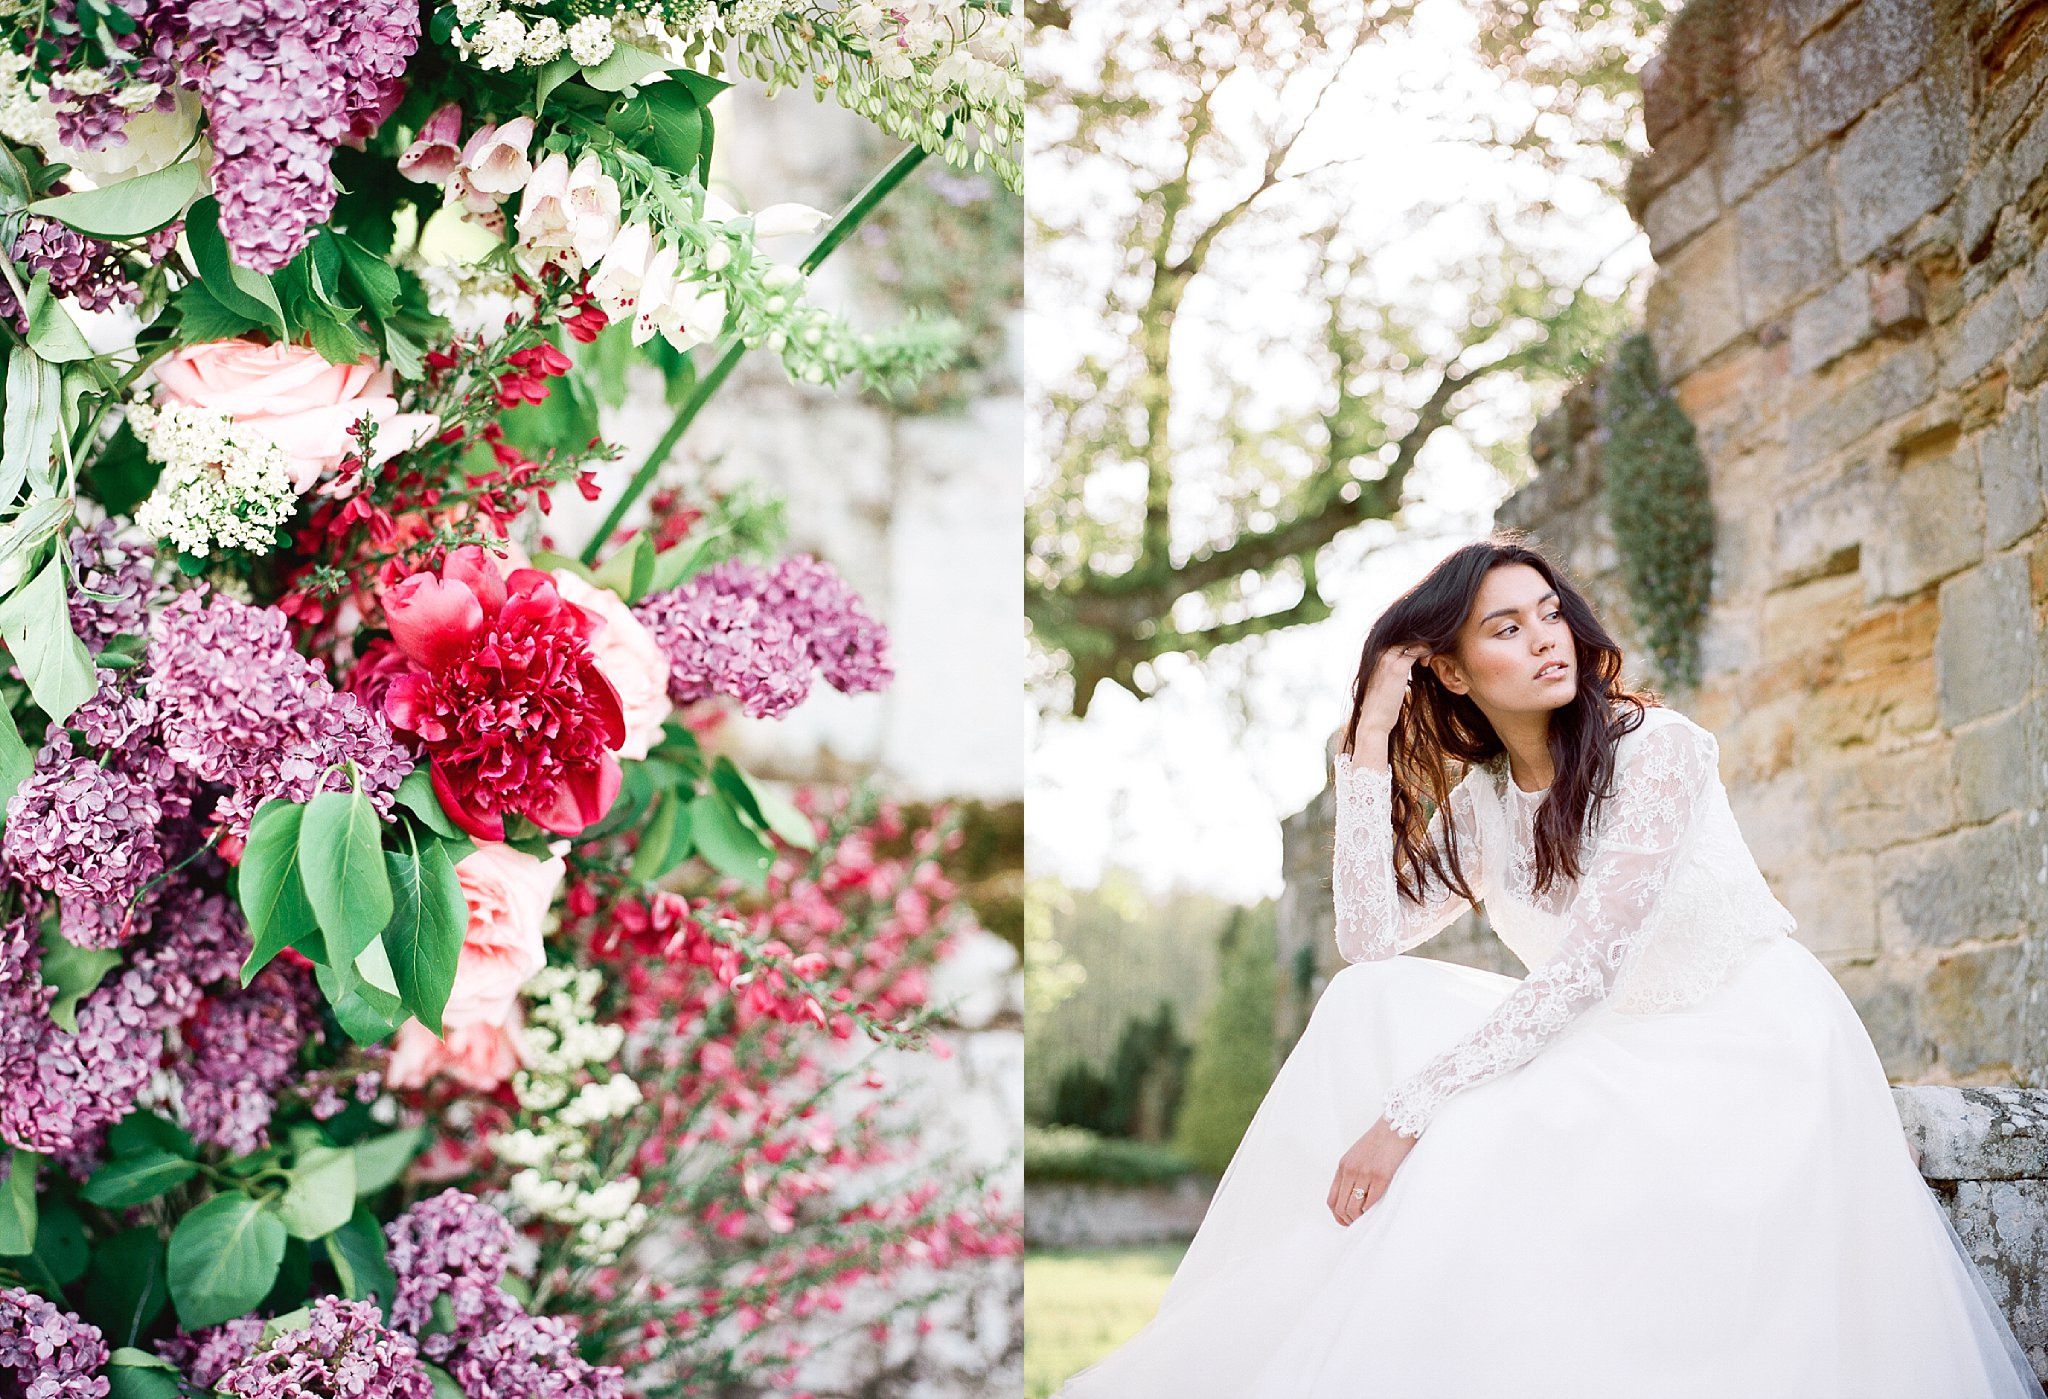 Destination Wedding Photographer,Fine Art Wedding Photographer,Kylee Yee,Kylee Yee Photography,London Wedding Photographer,NYC Wedding Photographer,Wedding and Portrait Photographer,